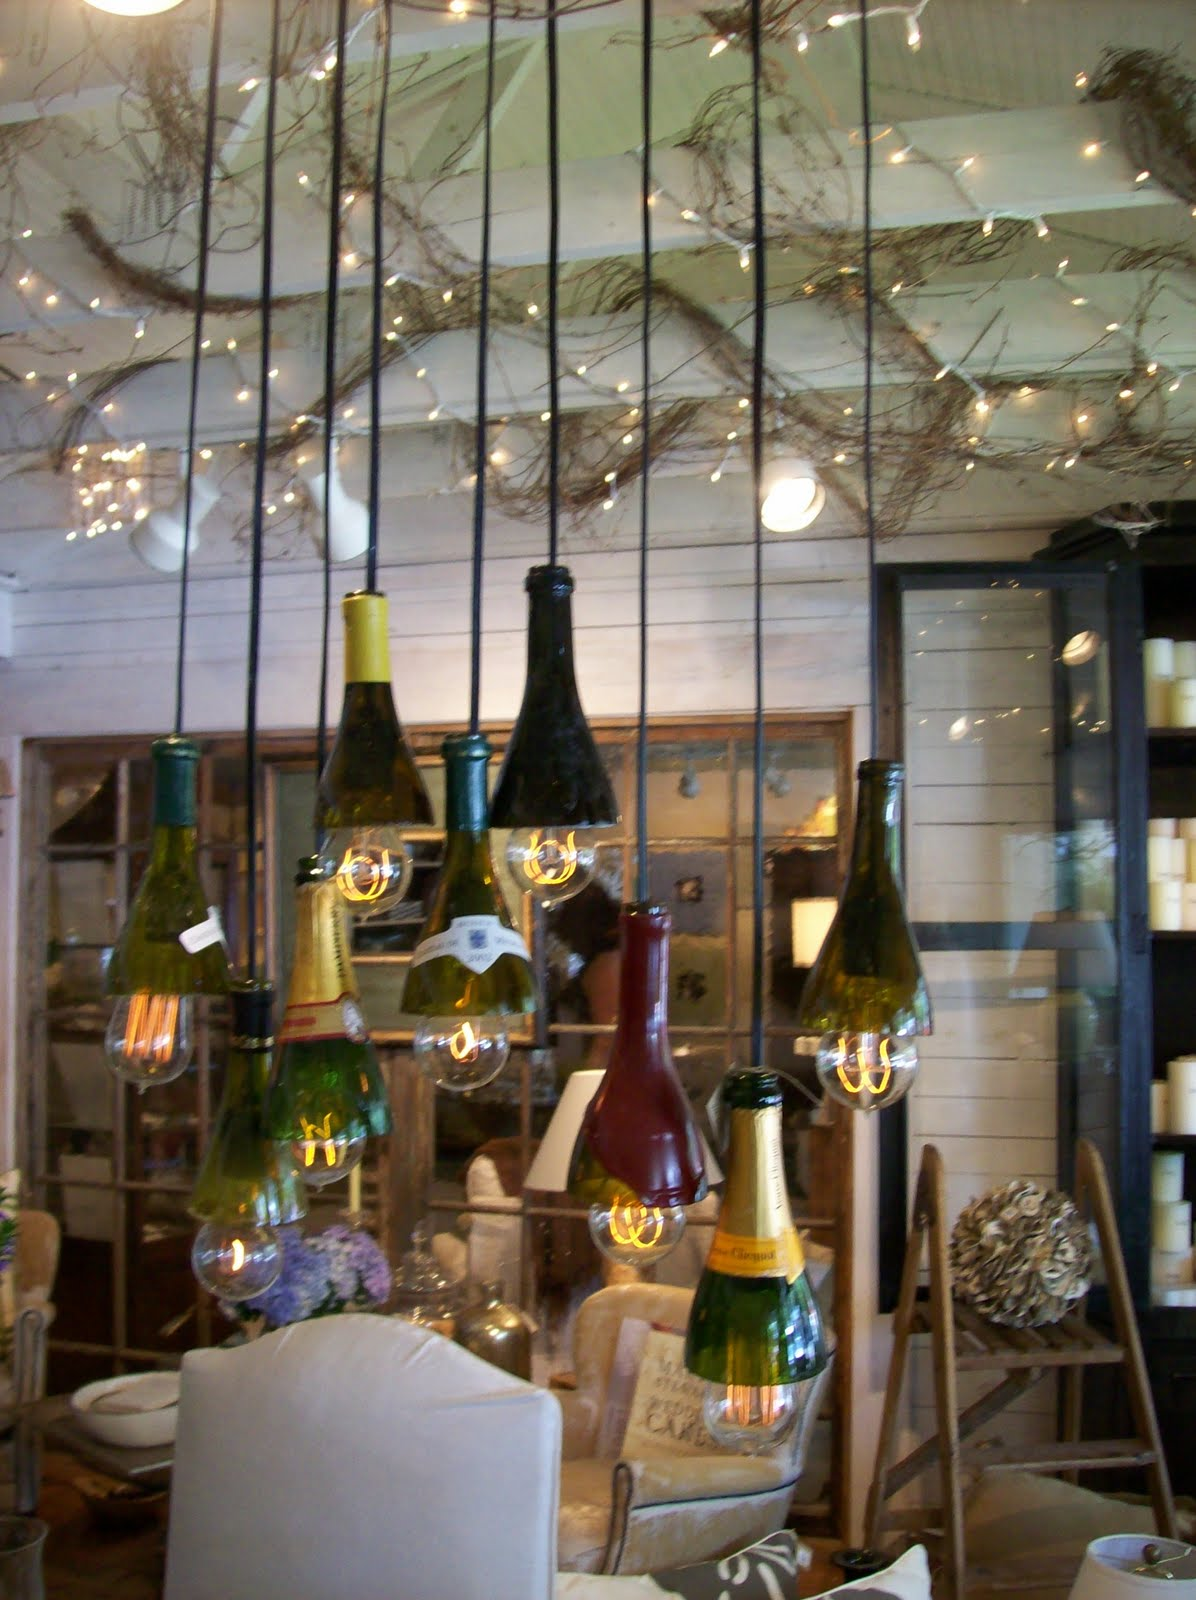 The pineapple room wine bottle chandelier - Wine bottles chandelier ...